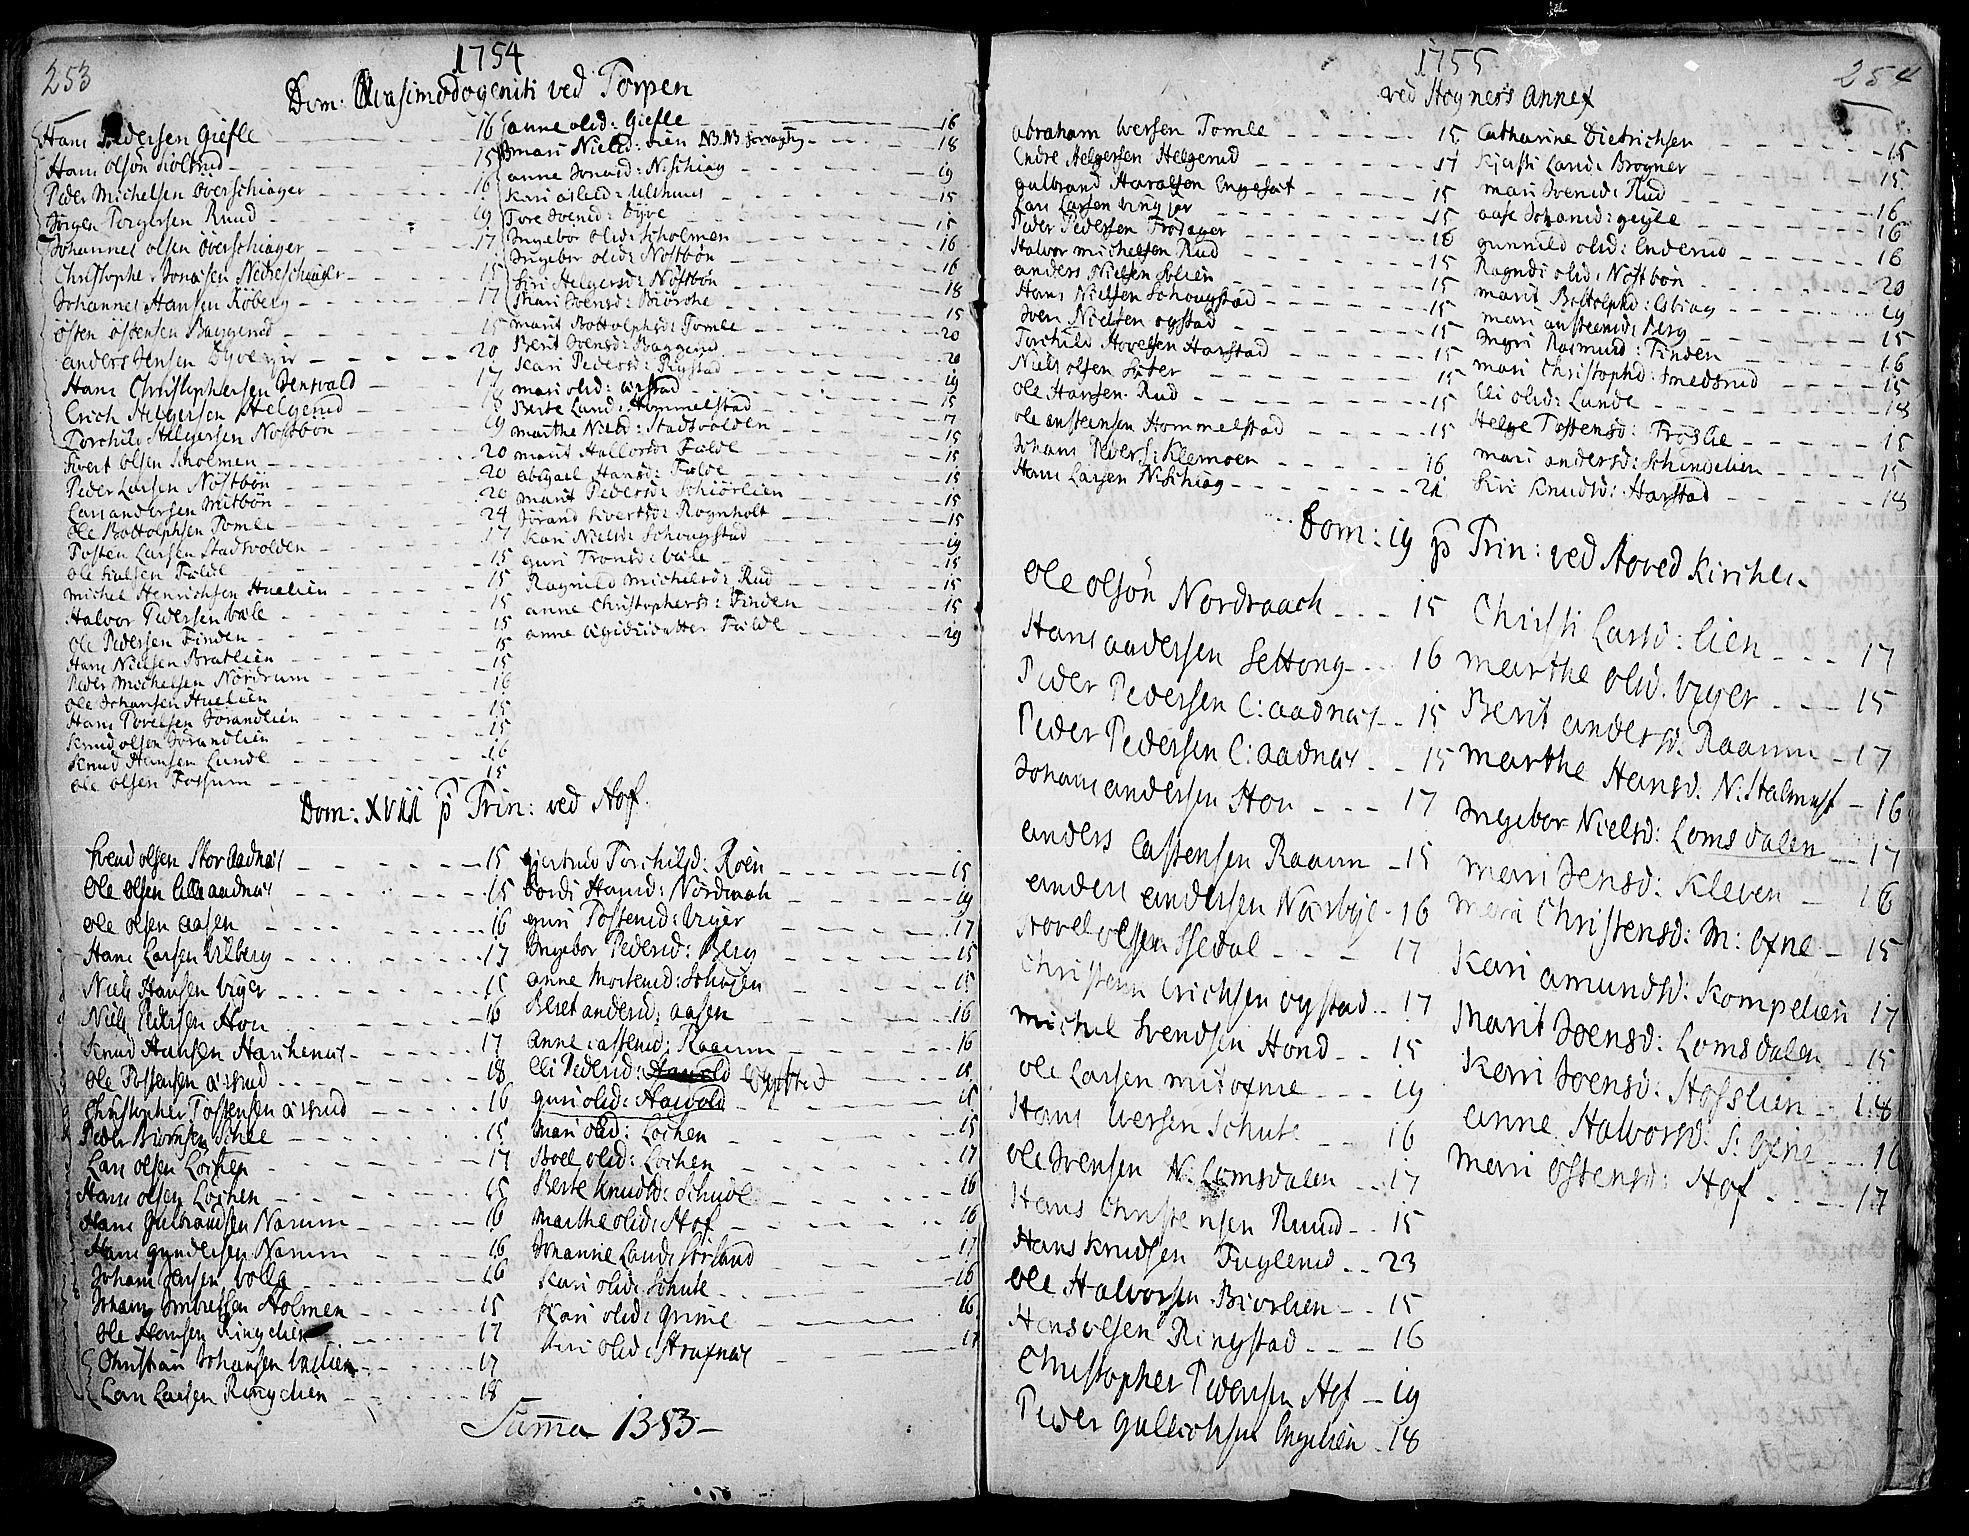 SAH, Land prestekontor, Ministerialbok nr. 2, 1733-1764, s. 253-254